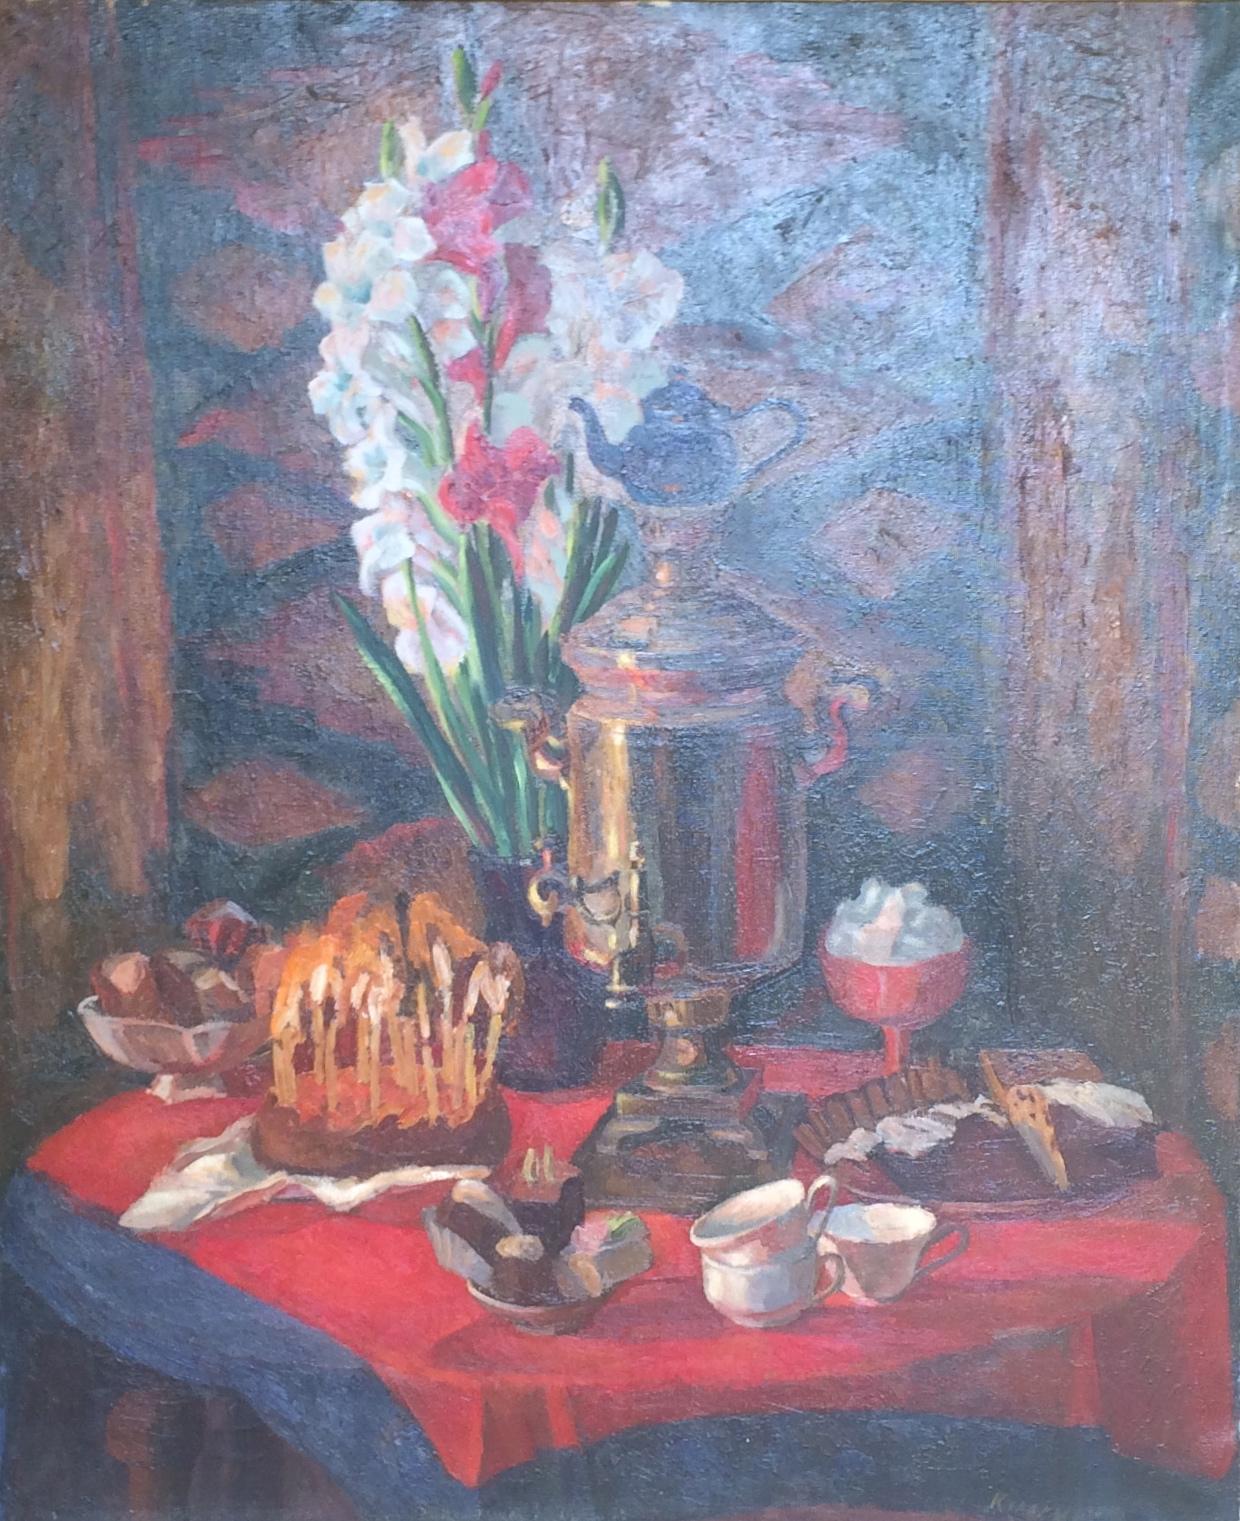 Кулагина Мария Эдвардовна. Самовар с выпечкой.